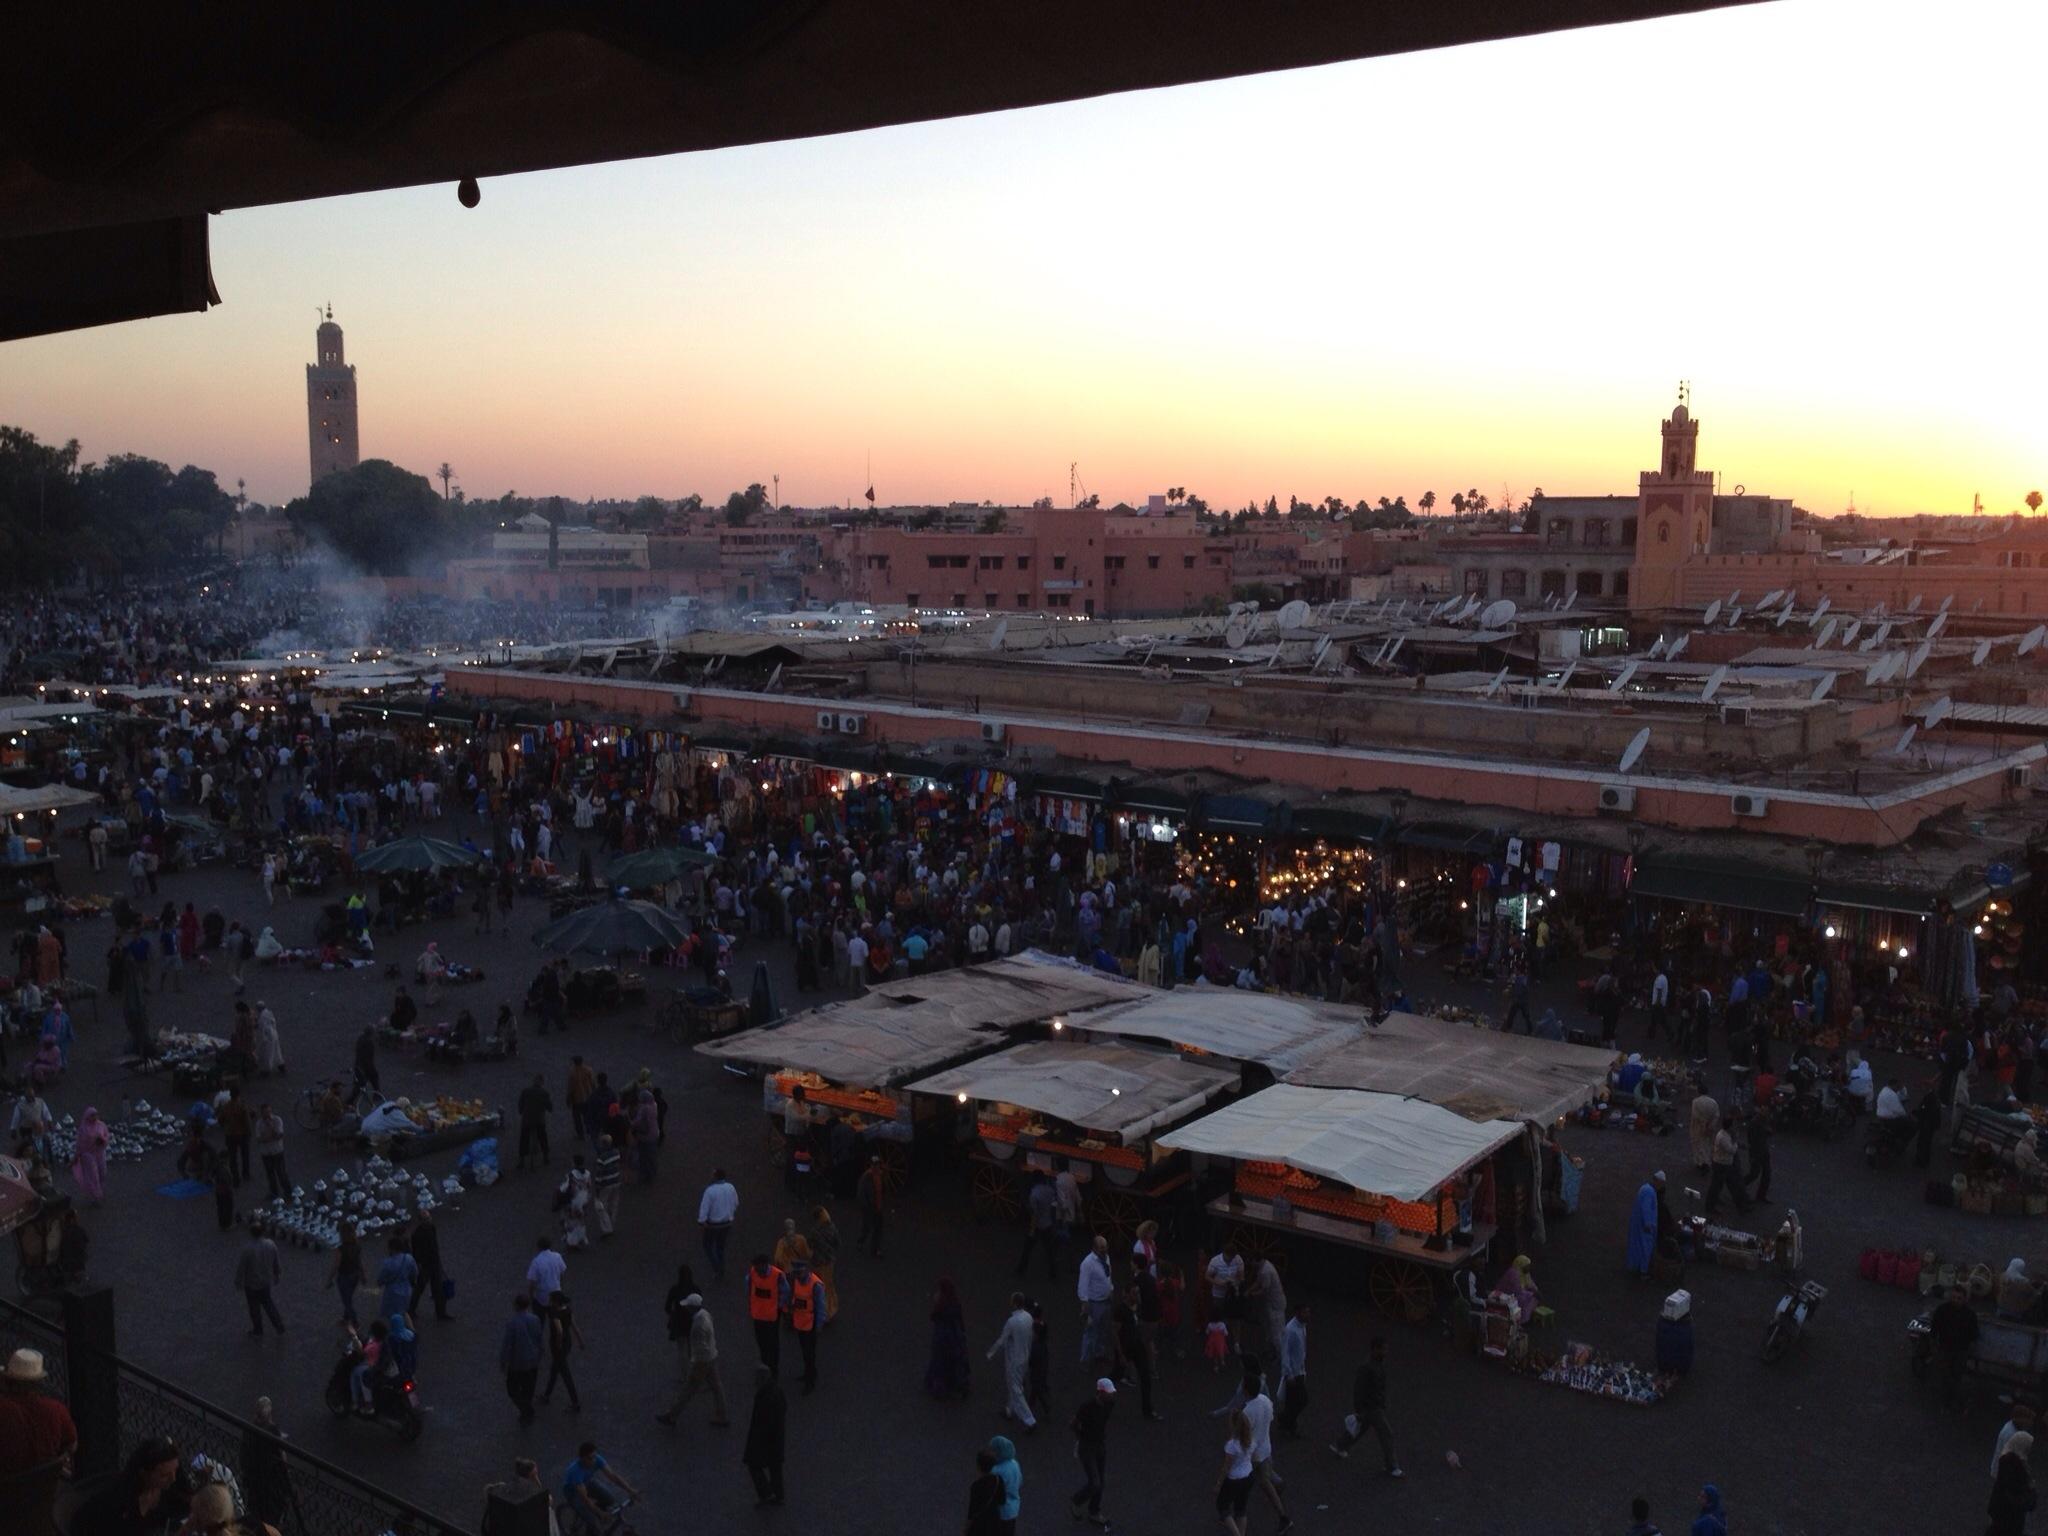 Jemaa square in Marrakech